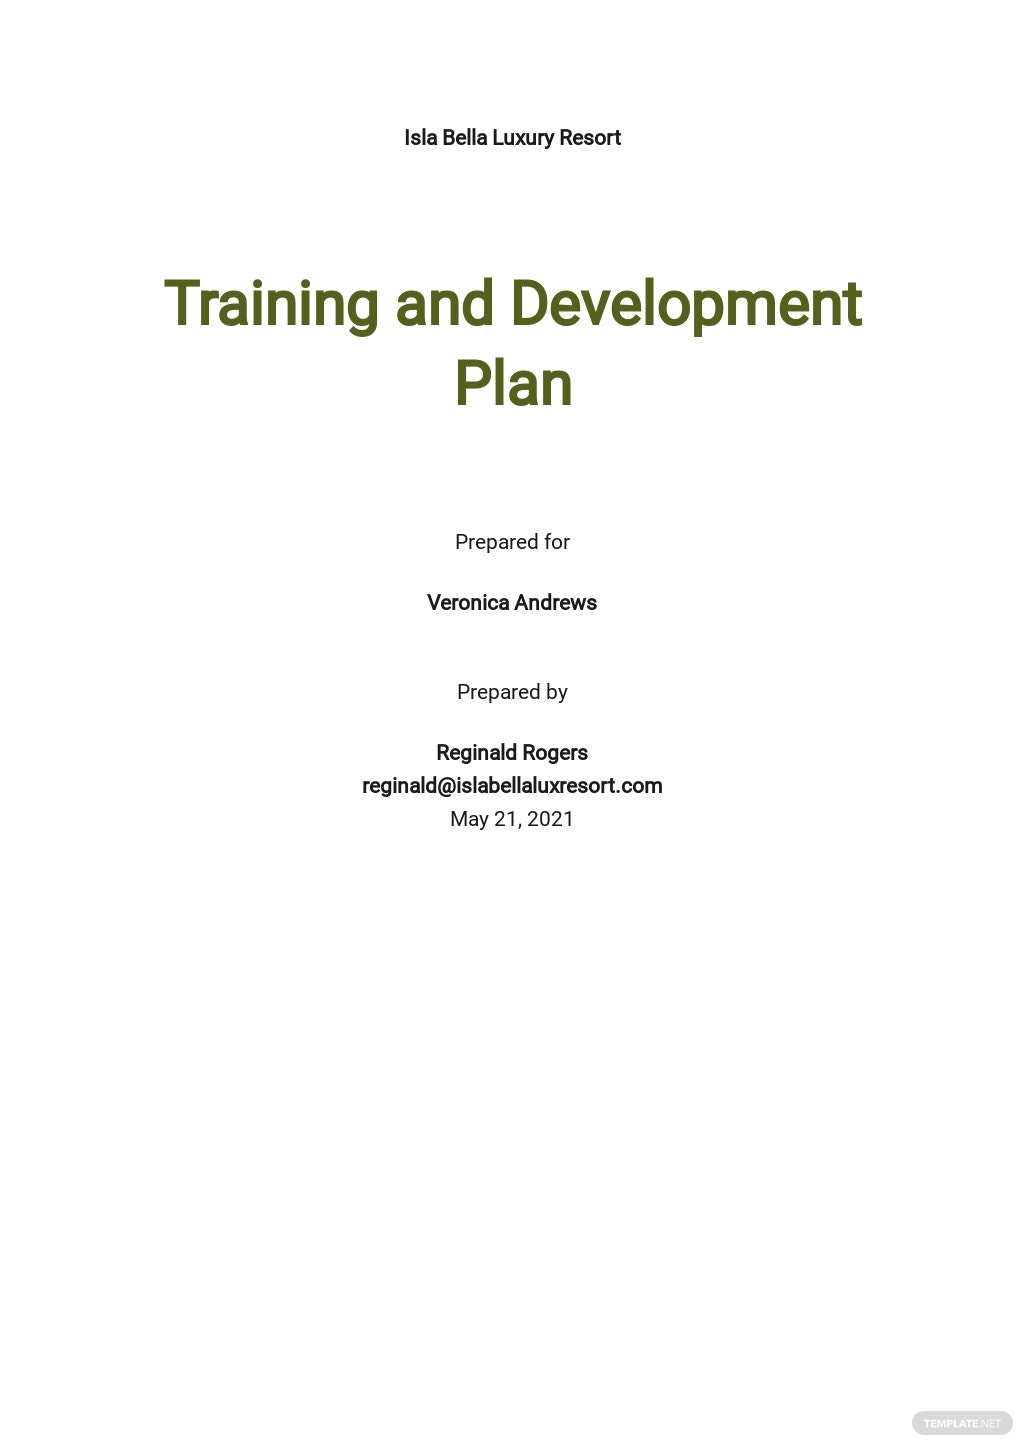 Training and Development Plan Template.jpe